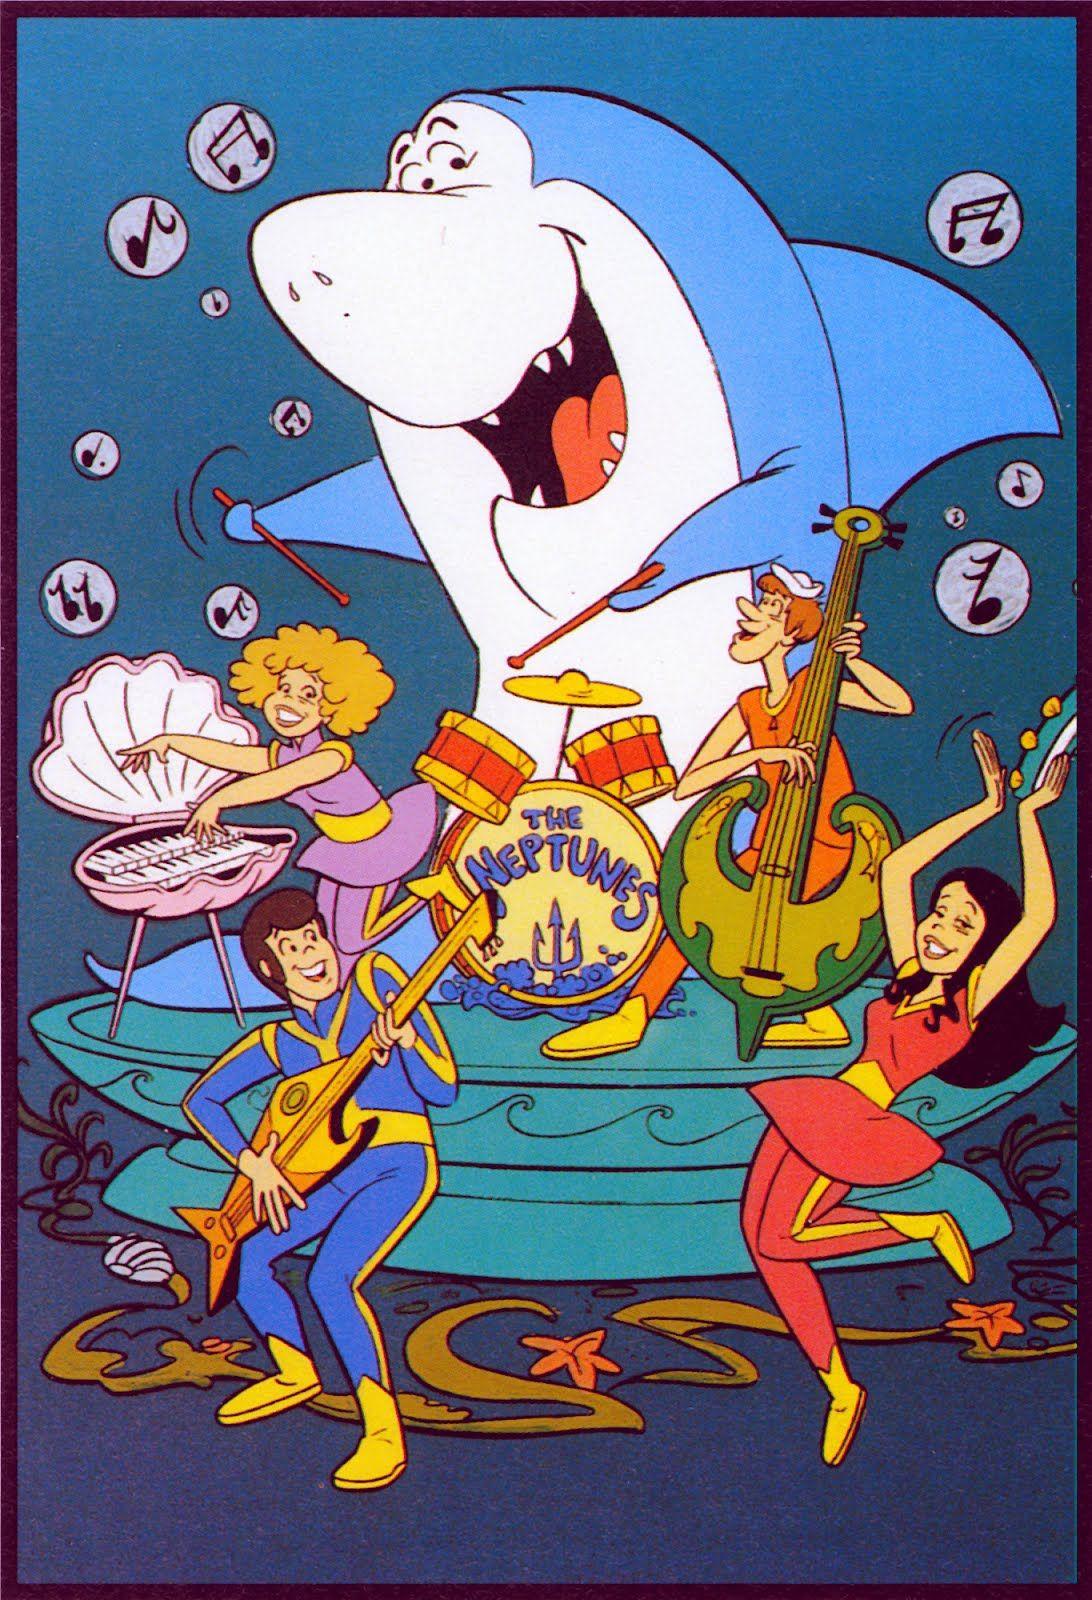 Cartoon Characters 1970s List : Hanna barbera world tutubarão módulo i